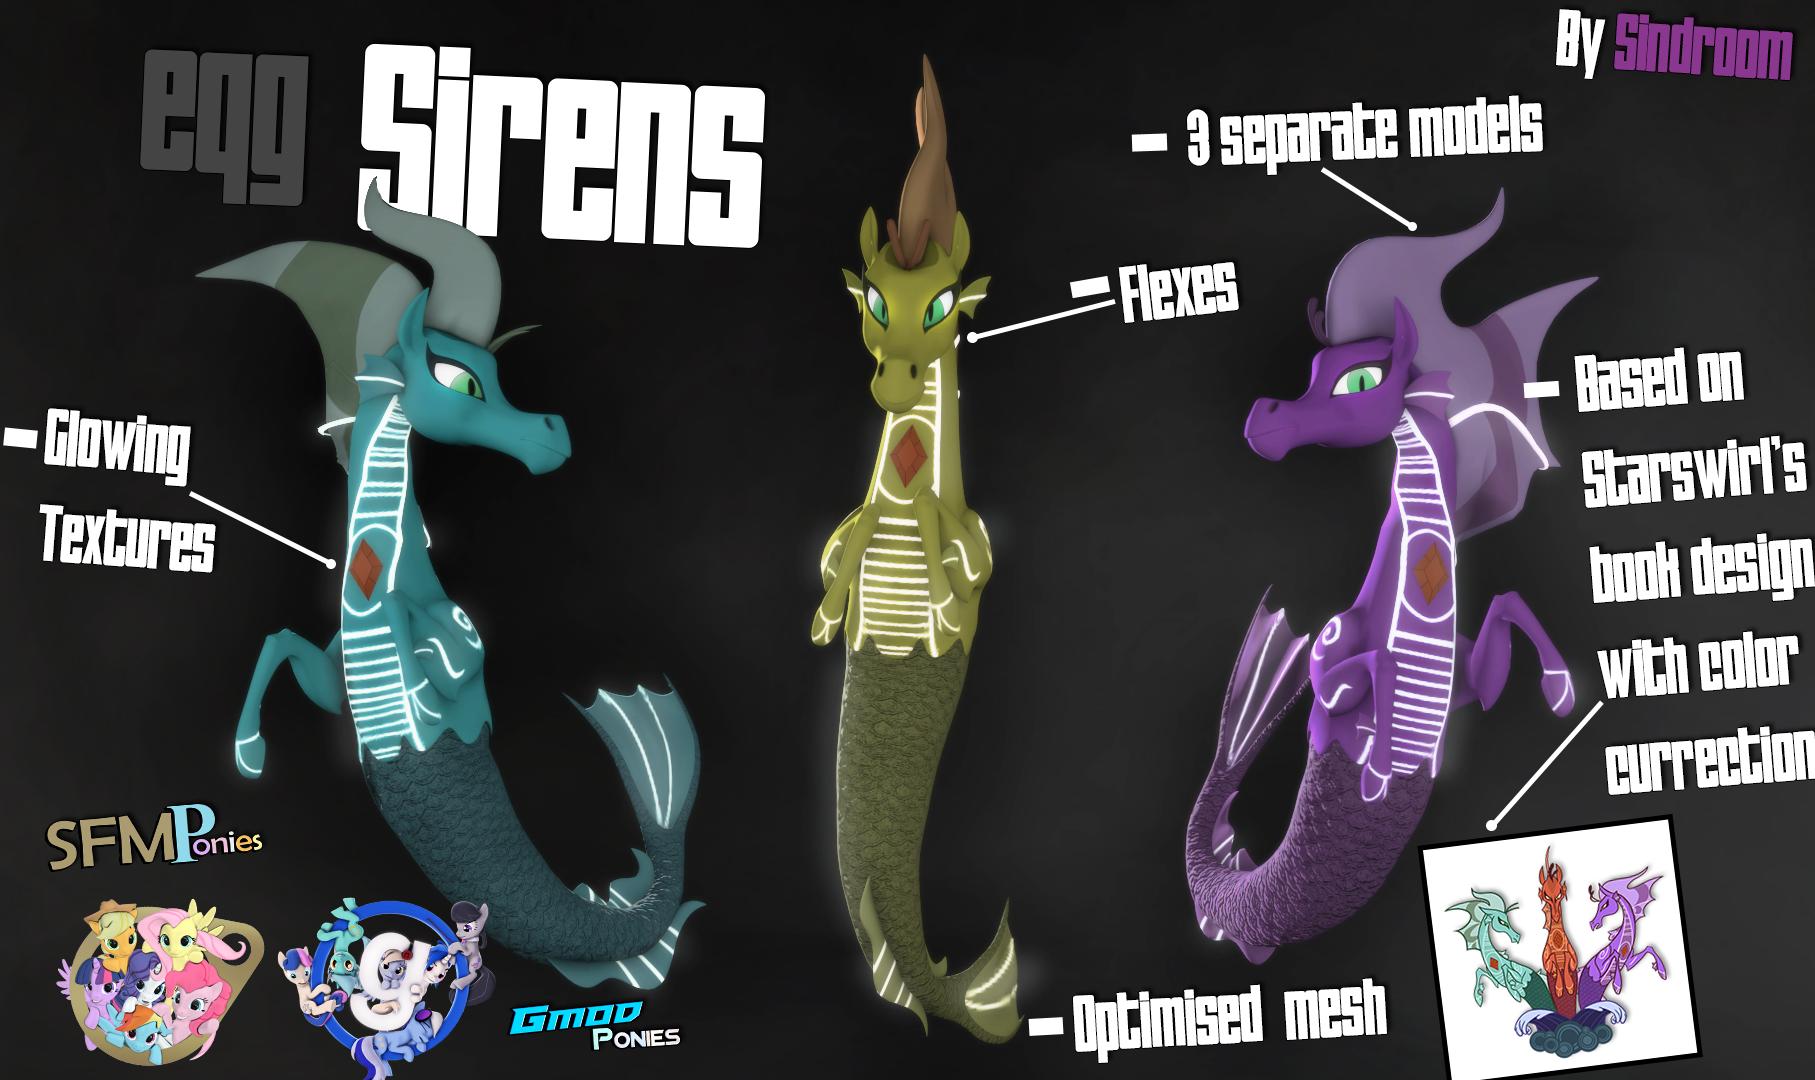 [SFM/Gmod] Sirens 1.3 by Sindroom